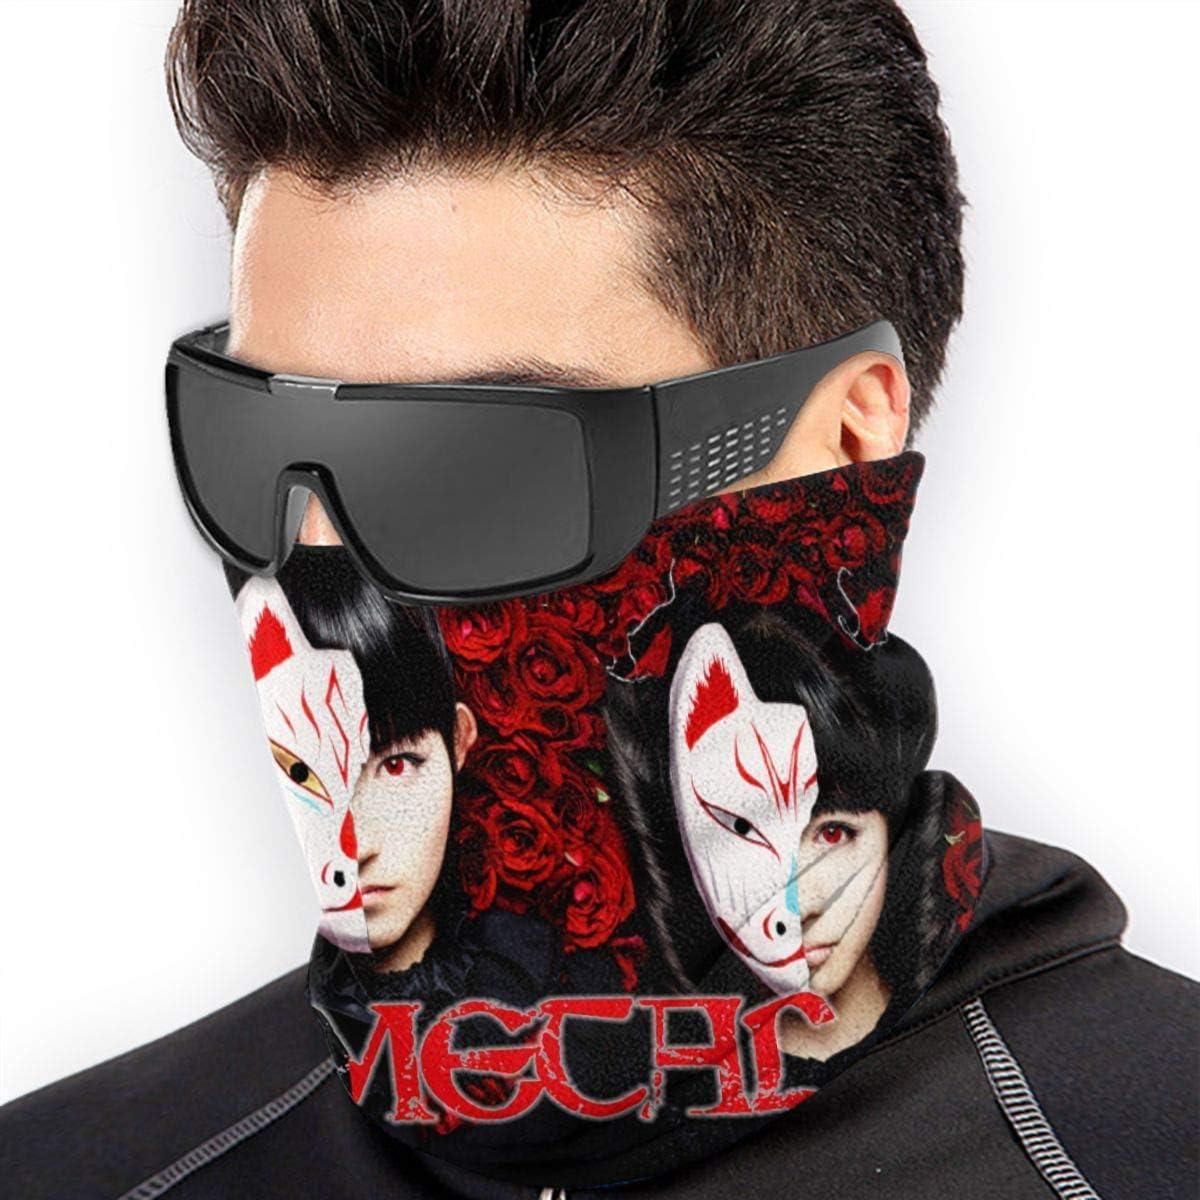 BabyMetal Winter Neck Warmer Unisex Thermal Fleece Neck Gaiter Face Mask For Cold Weather